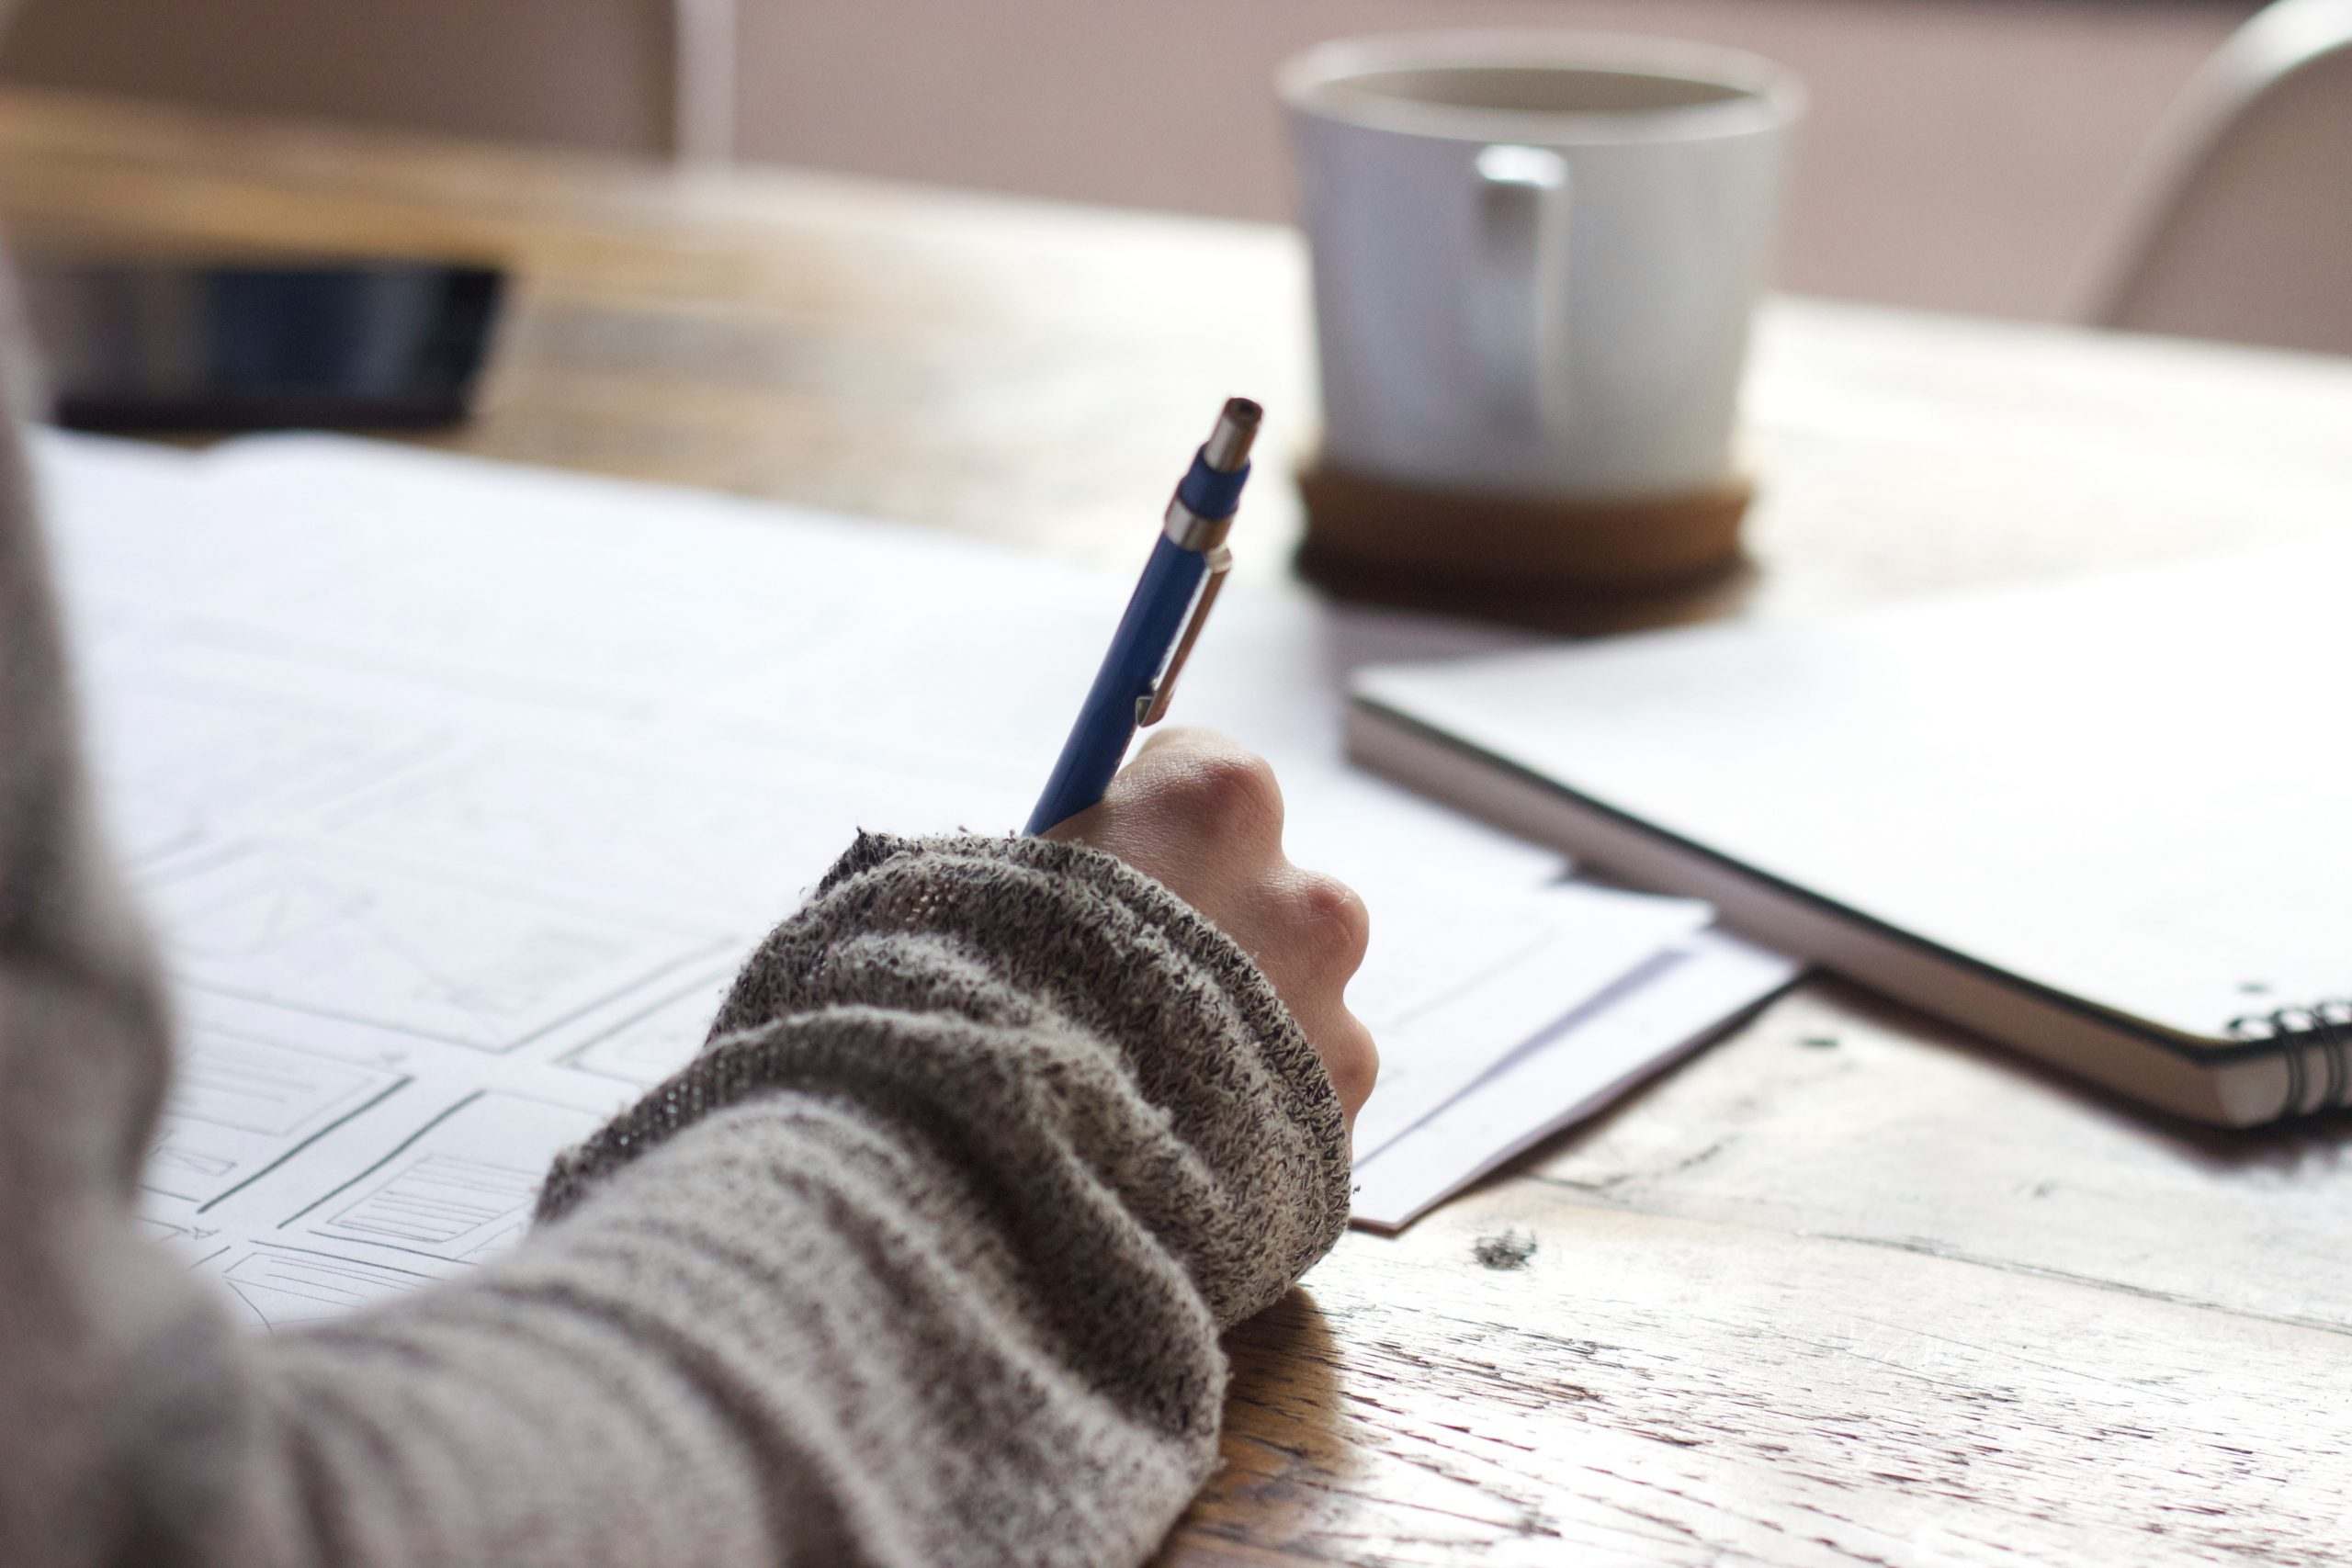 Update On Study Permit Under COVID-19